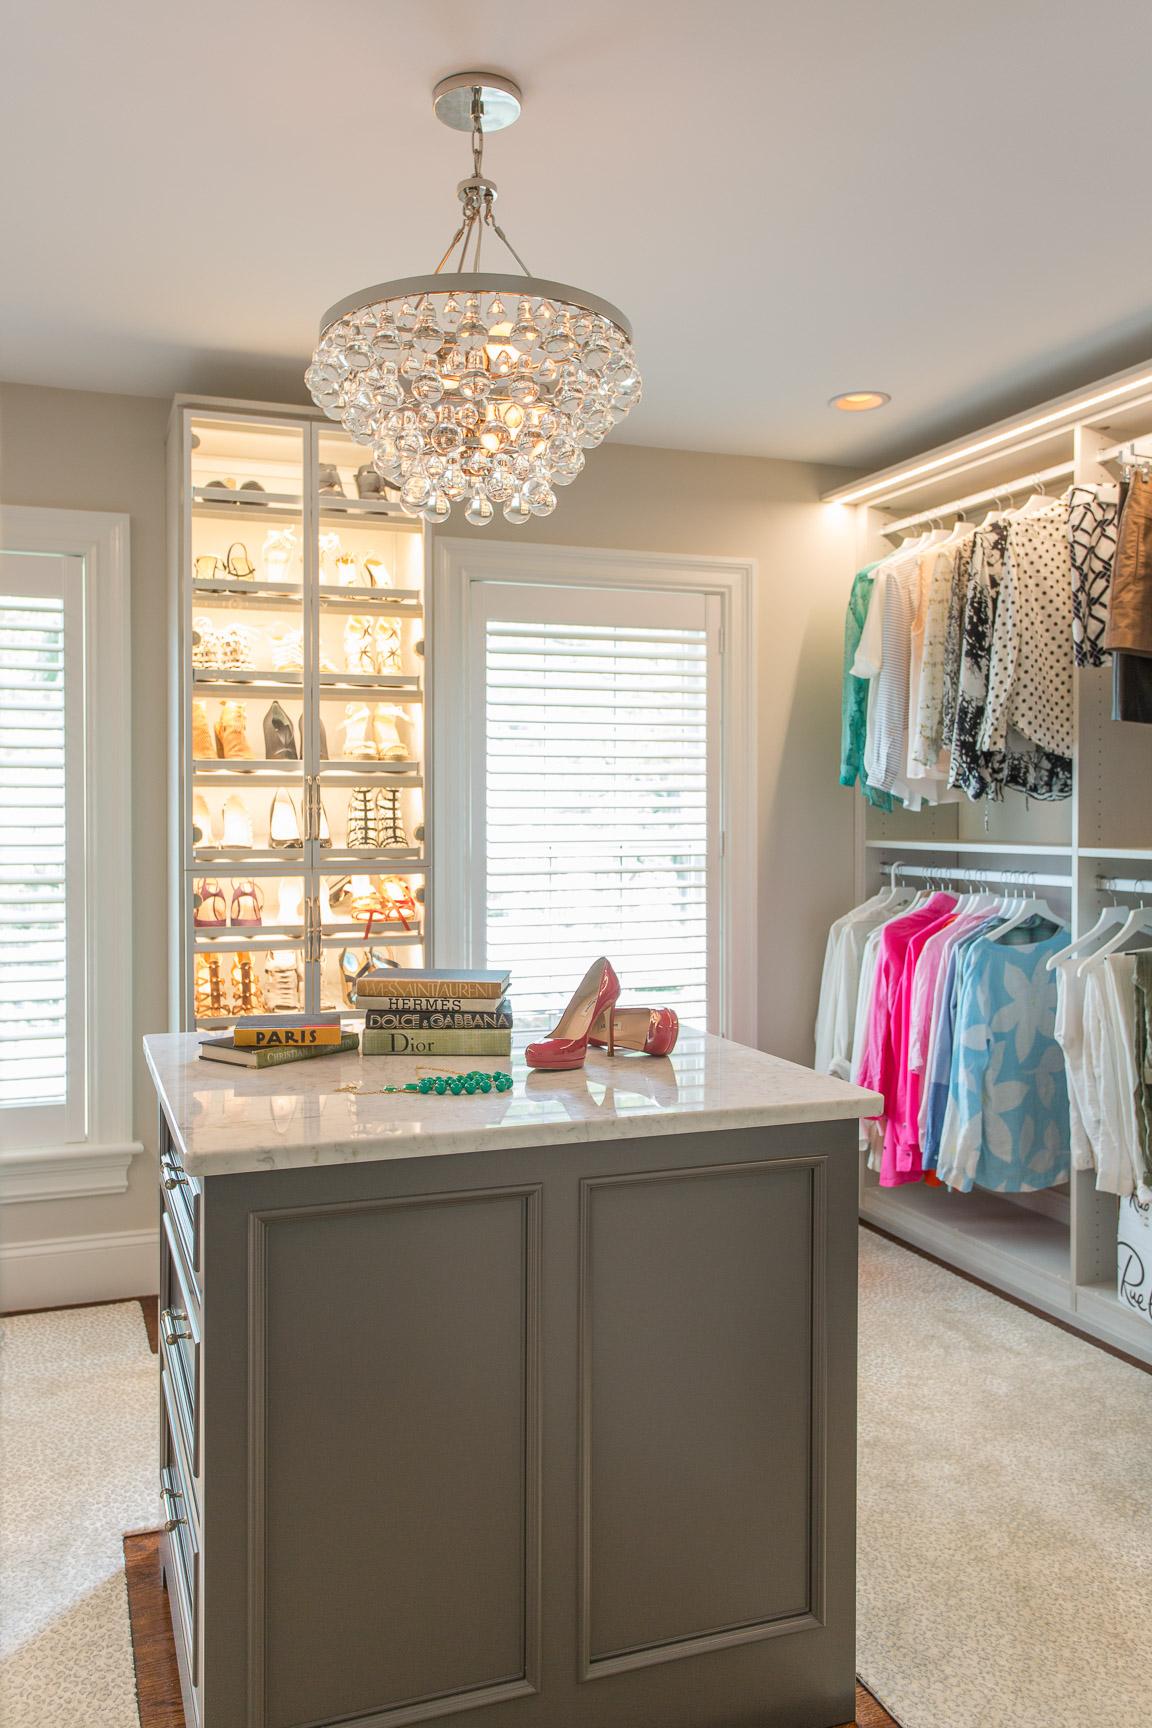 Suburban custom closet by Tiffany Leblanc of LeBlanc Design, LLC